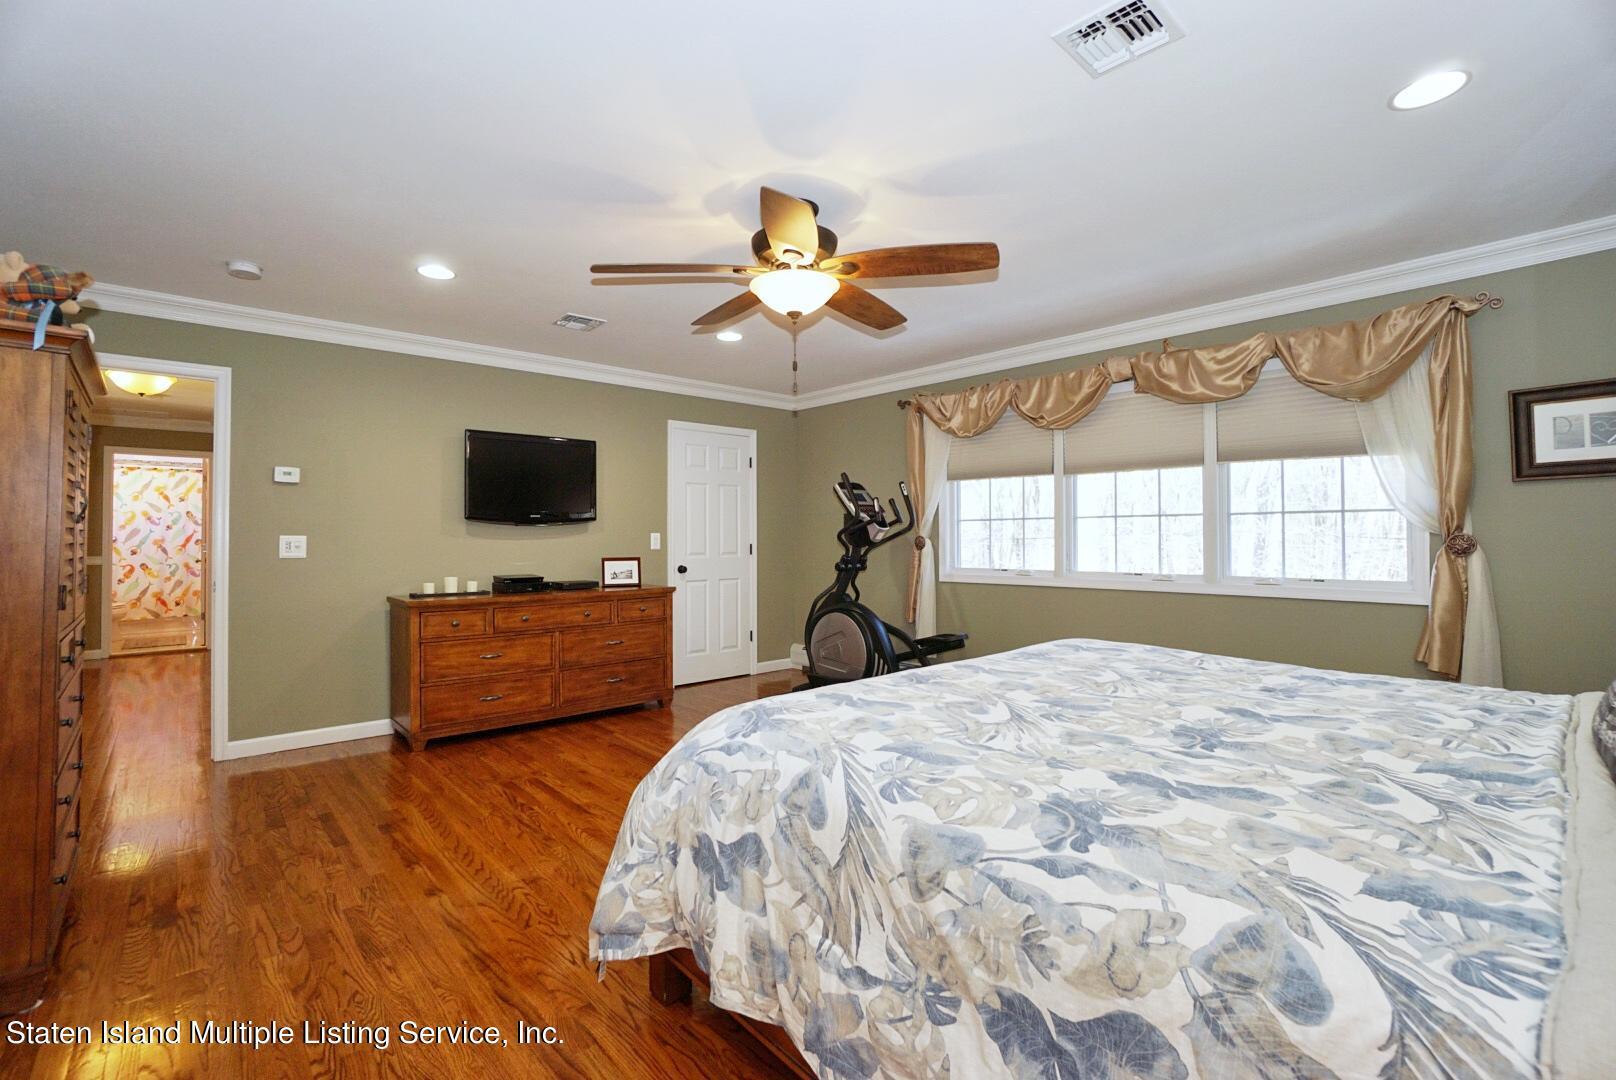 Single Family - Detached 31 Belwood Loop  Staten Island, NY 10307, MLS-1143133-32